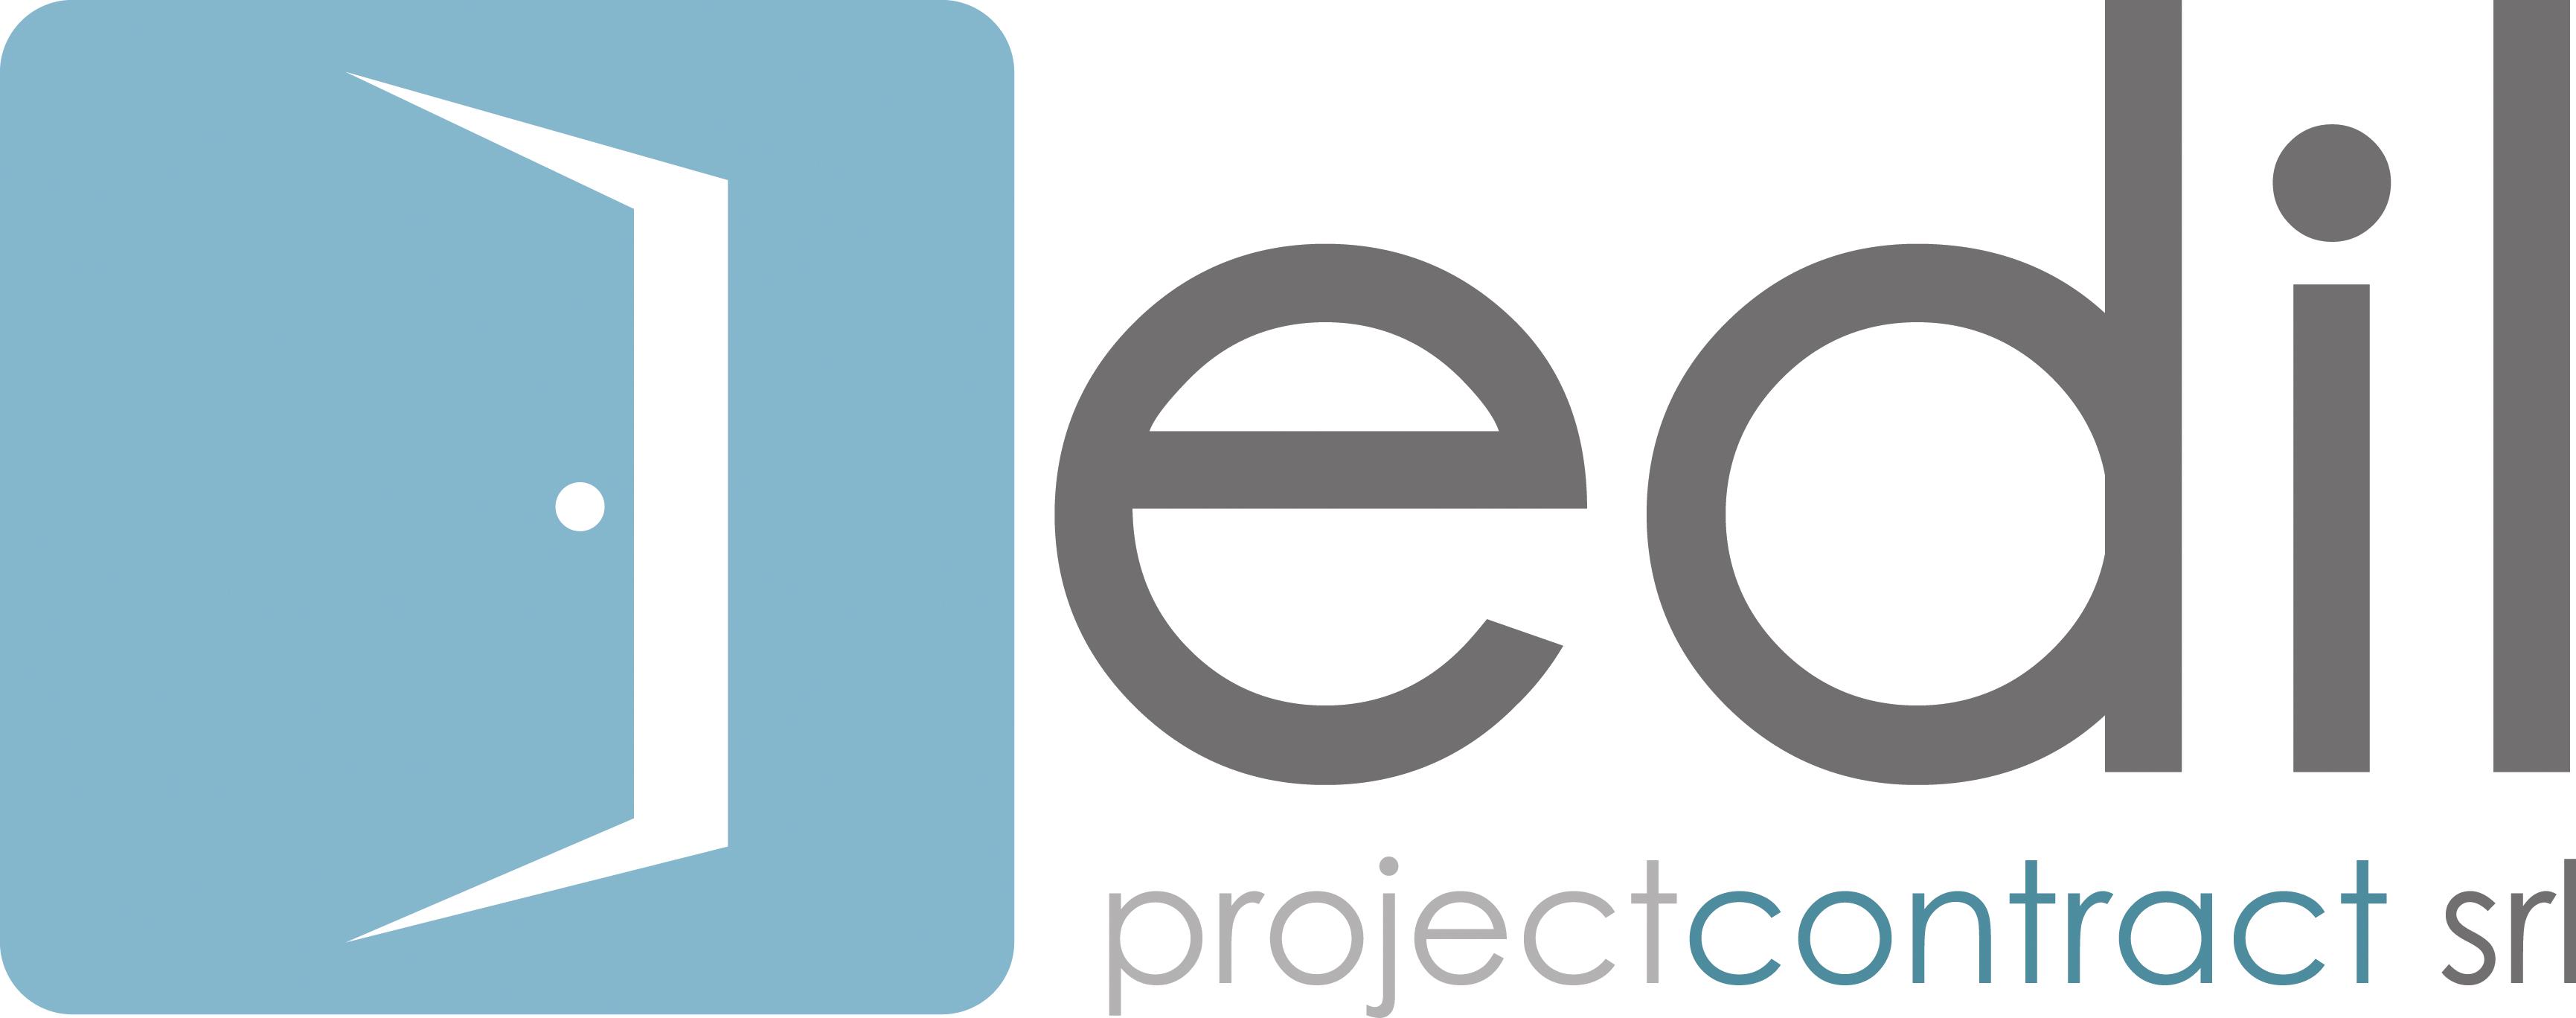 Edil Project Contract S.r.l.